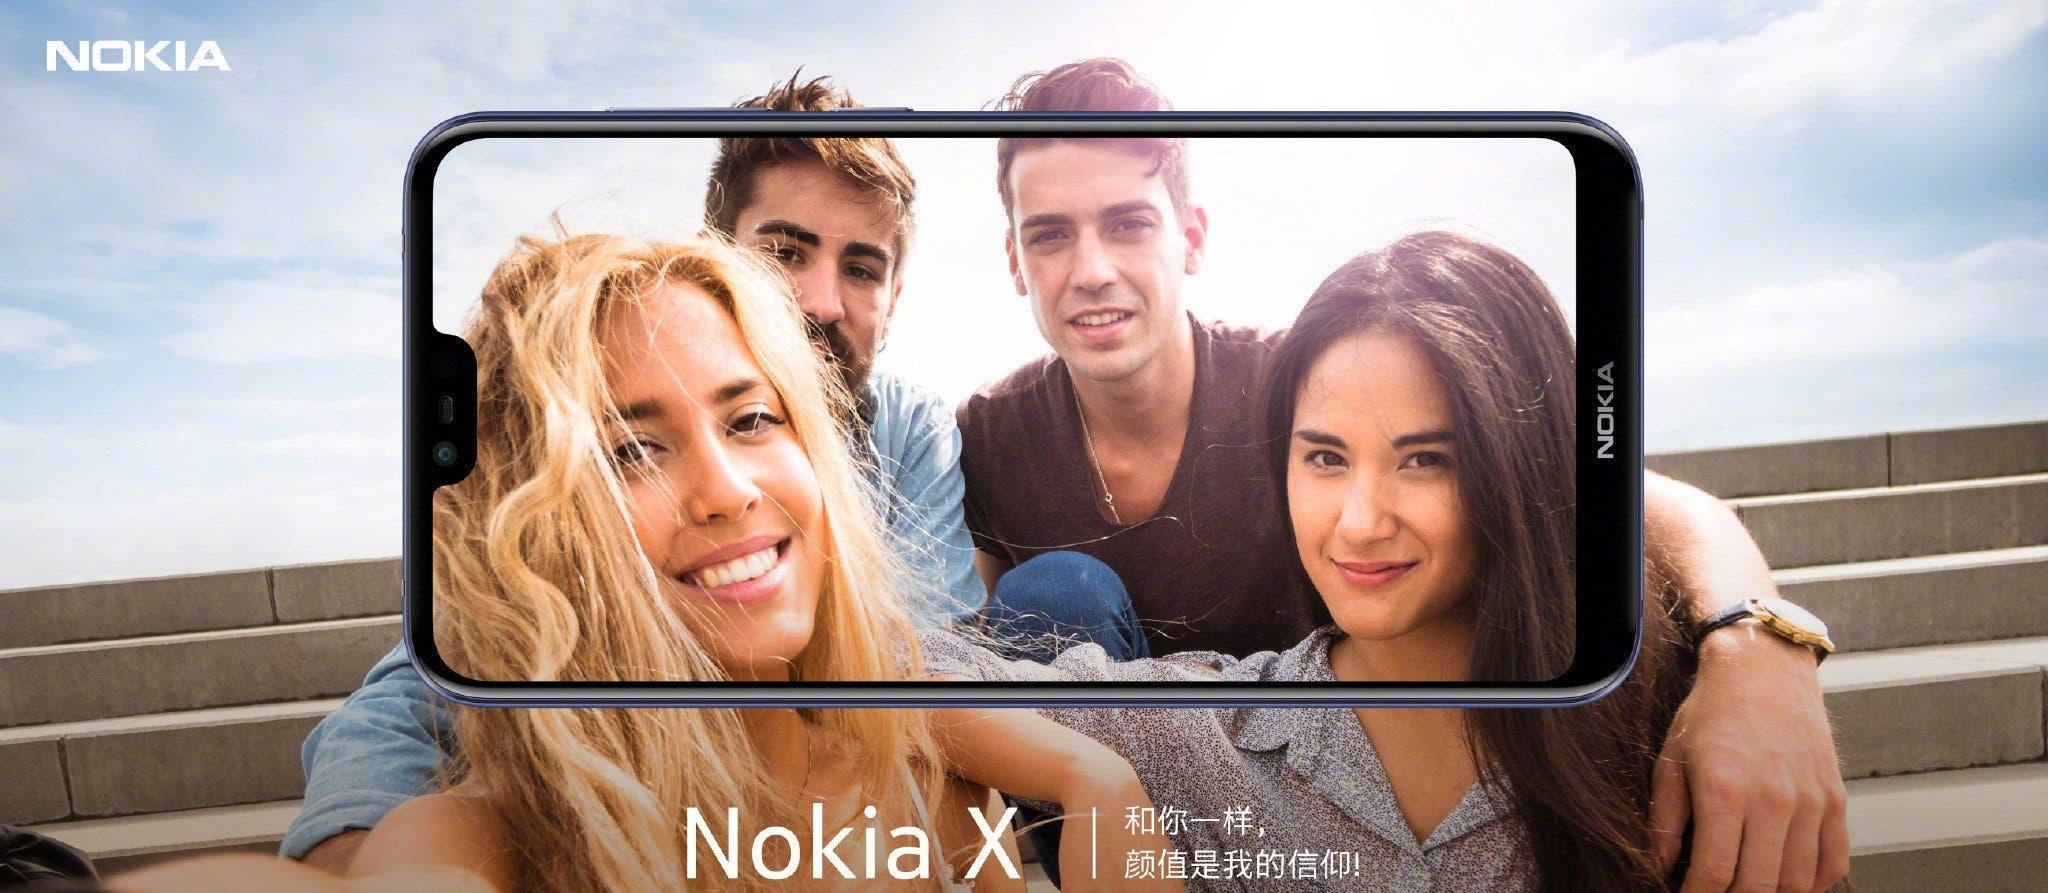 imagen promocional del nokia x6